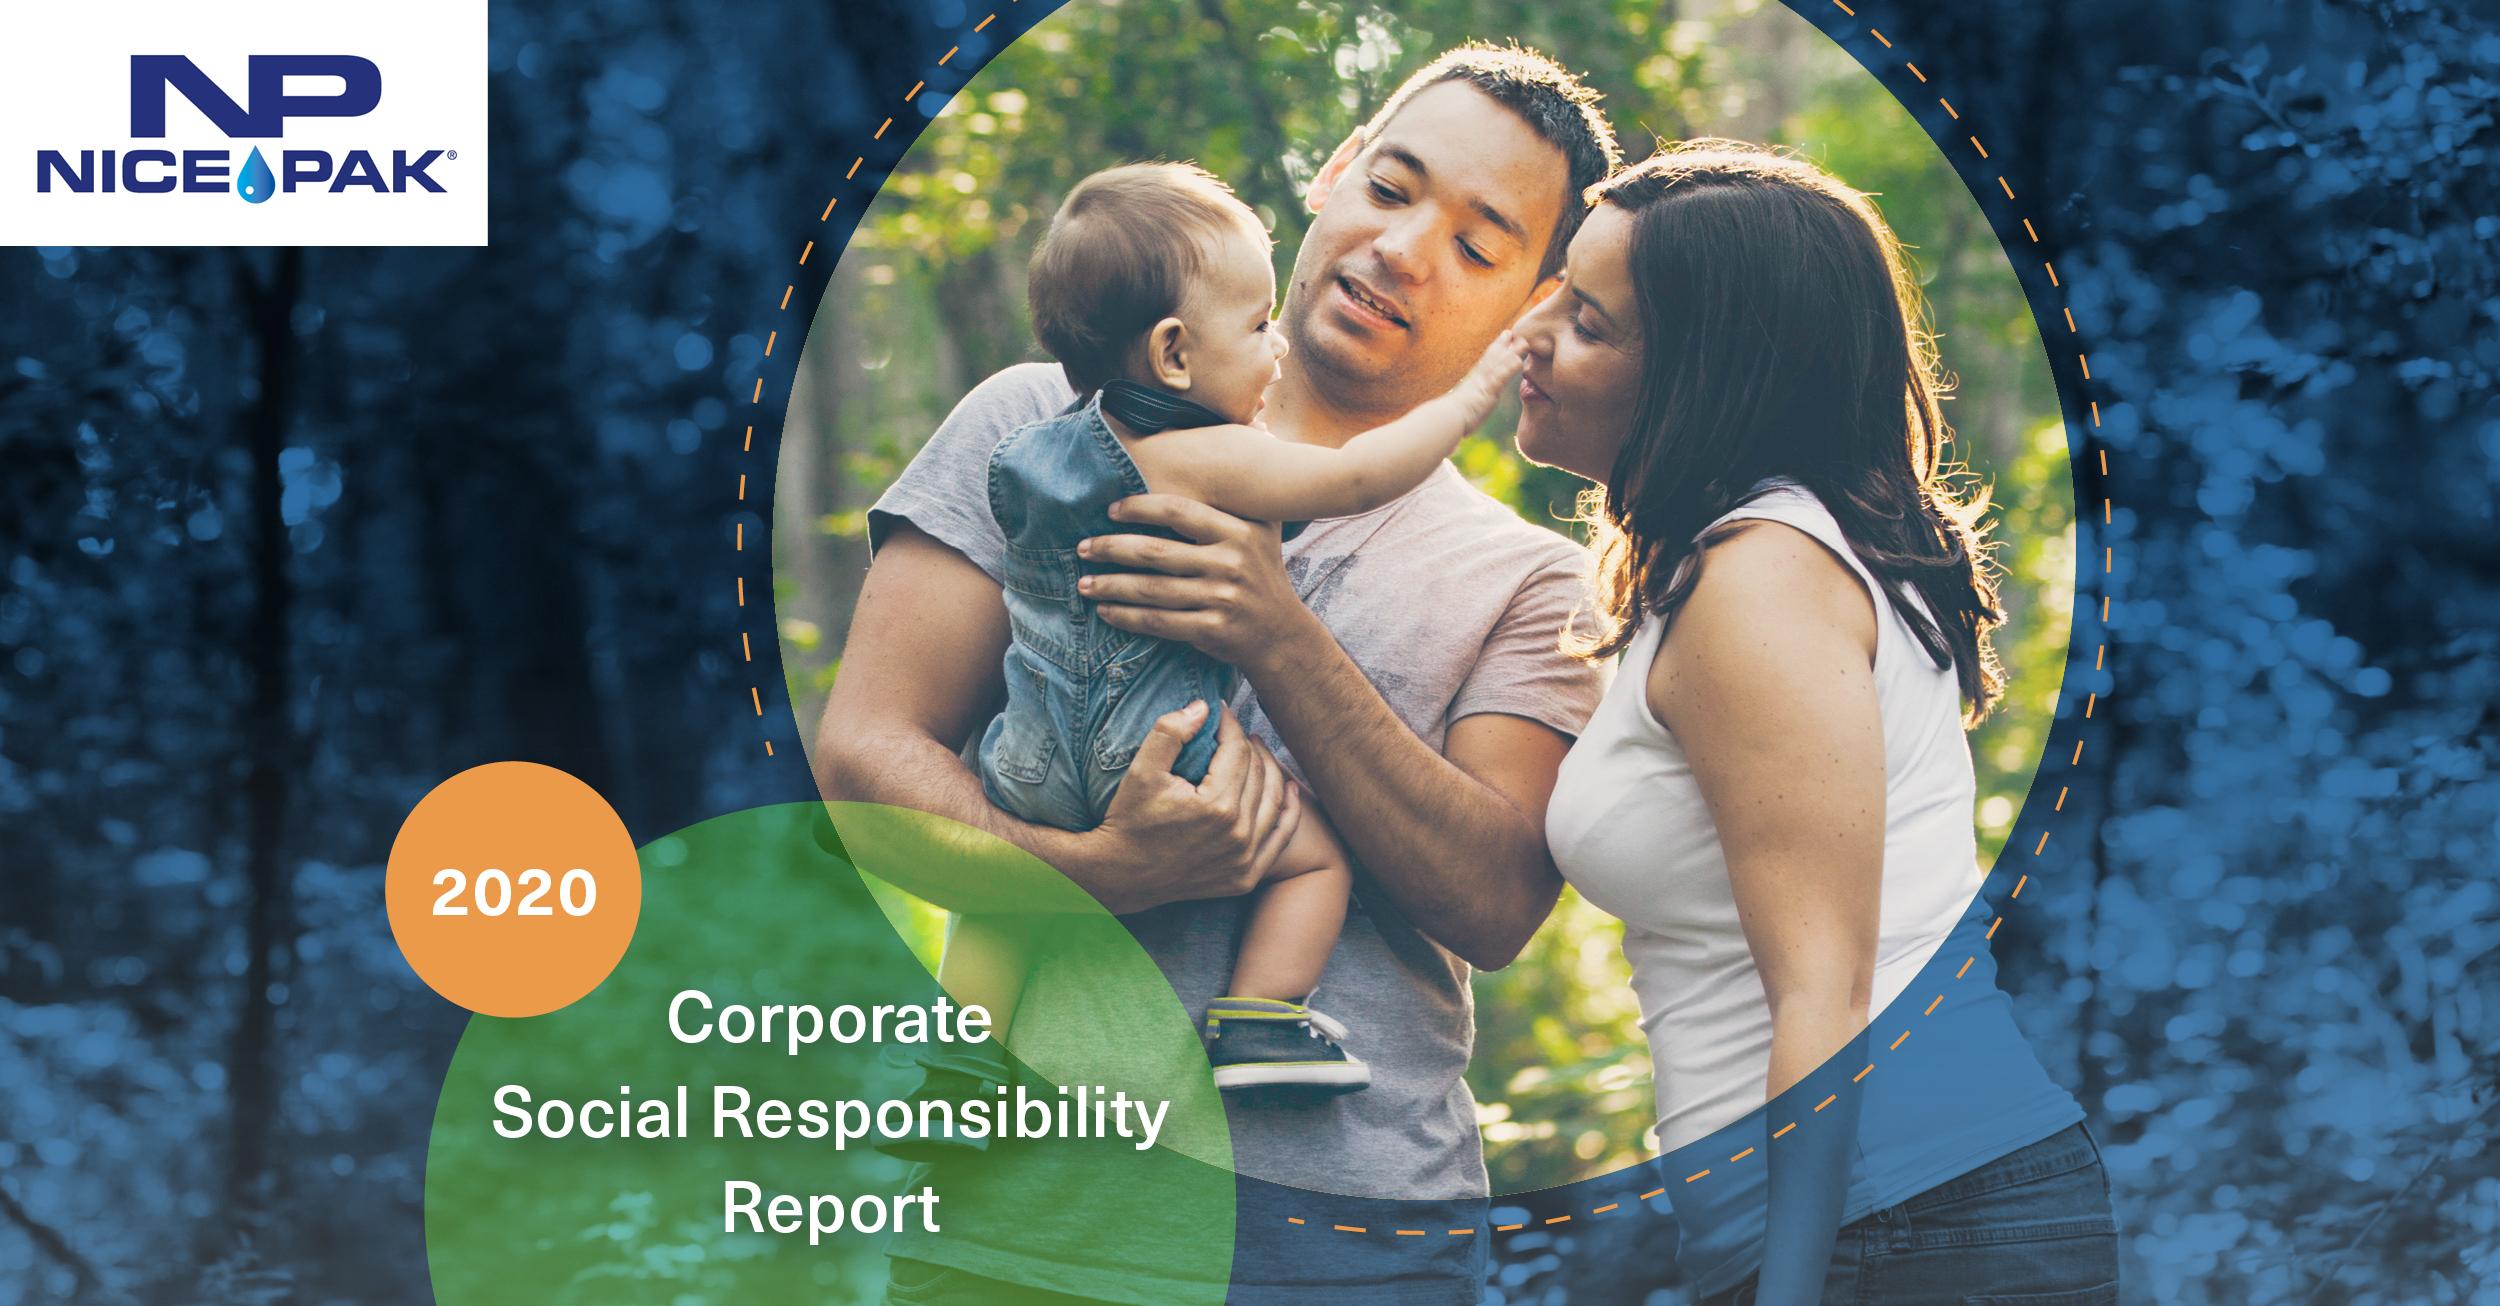 2020 Corporate Social Responsibility Report